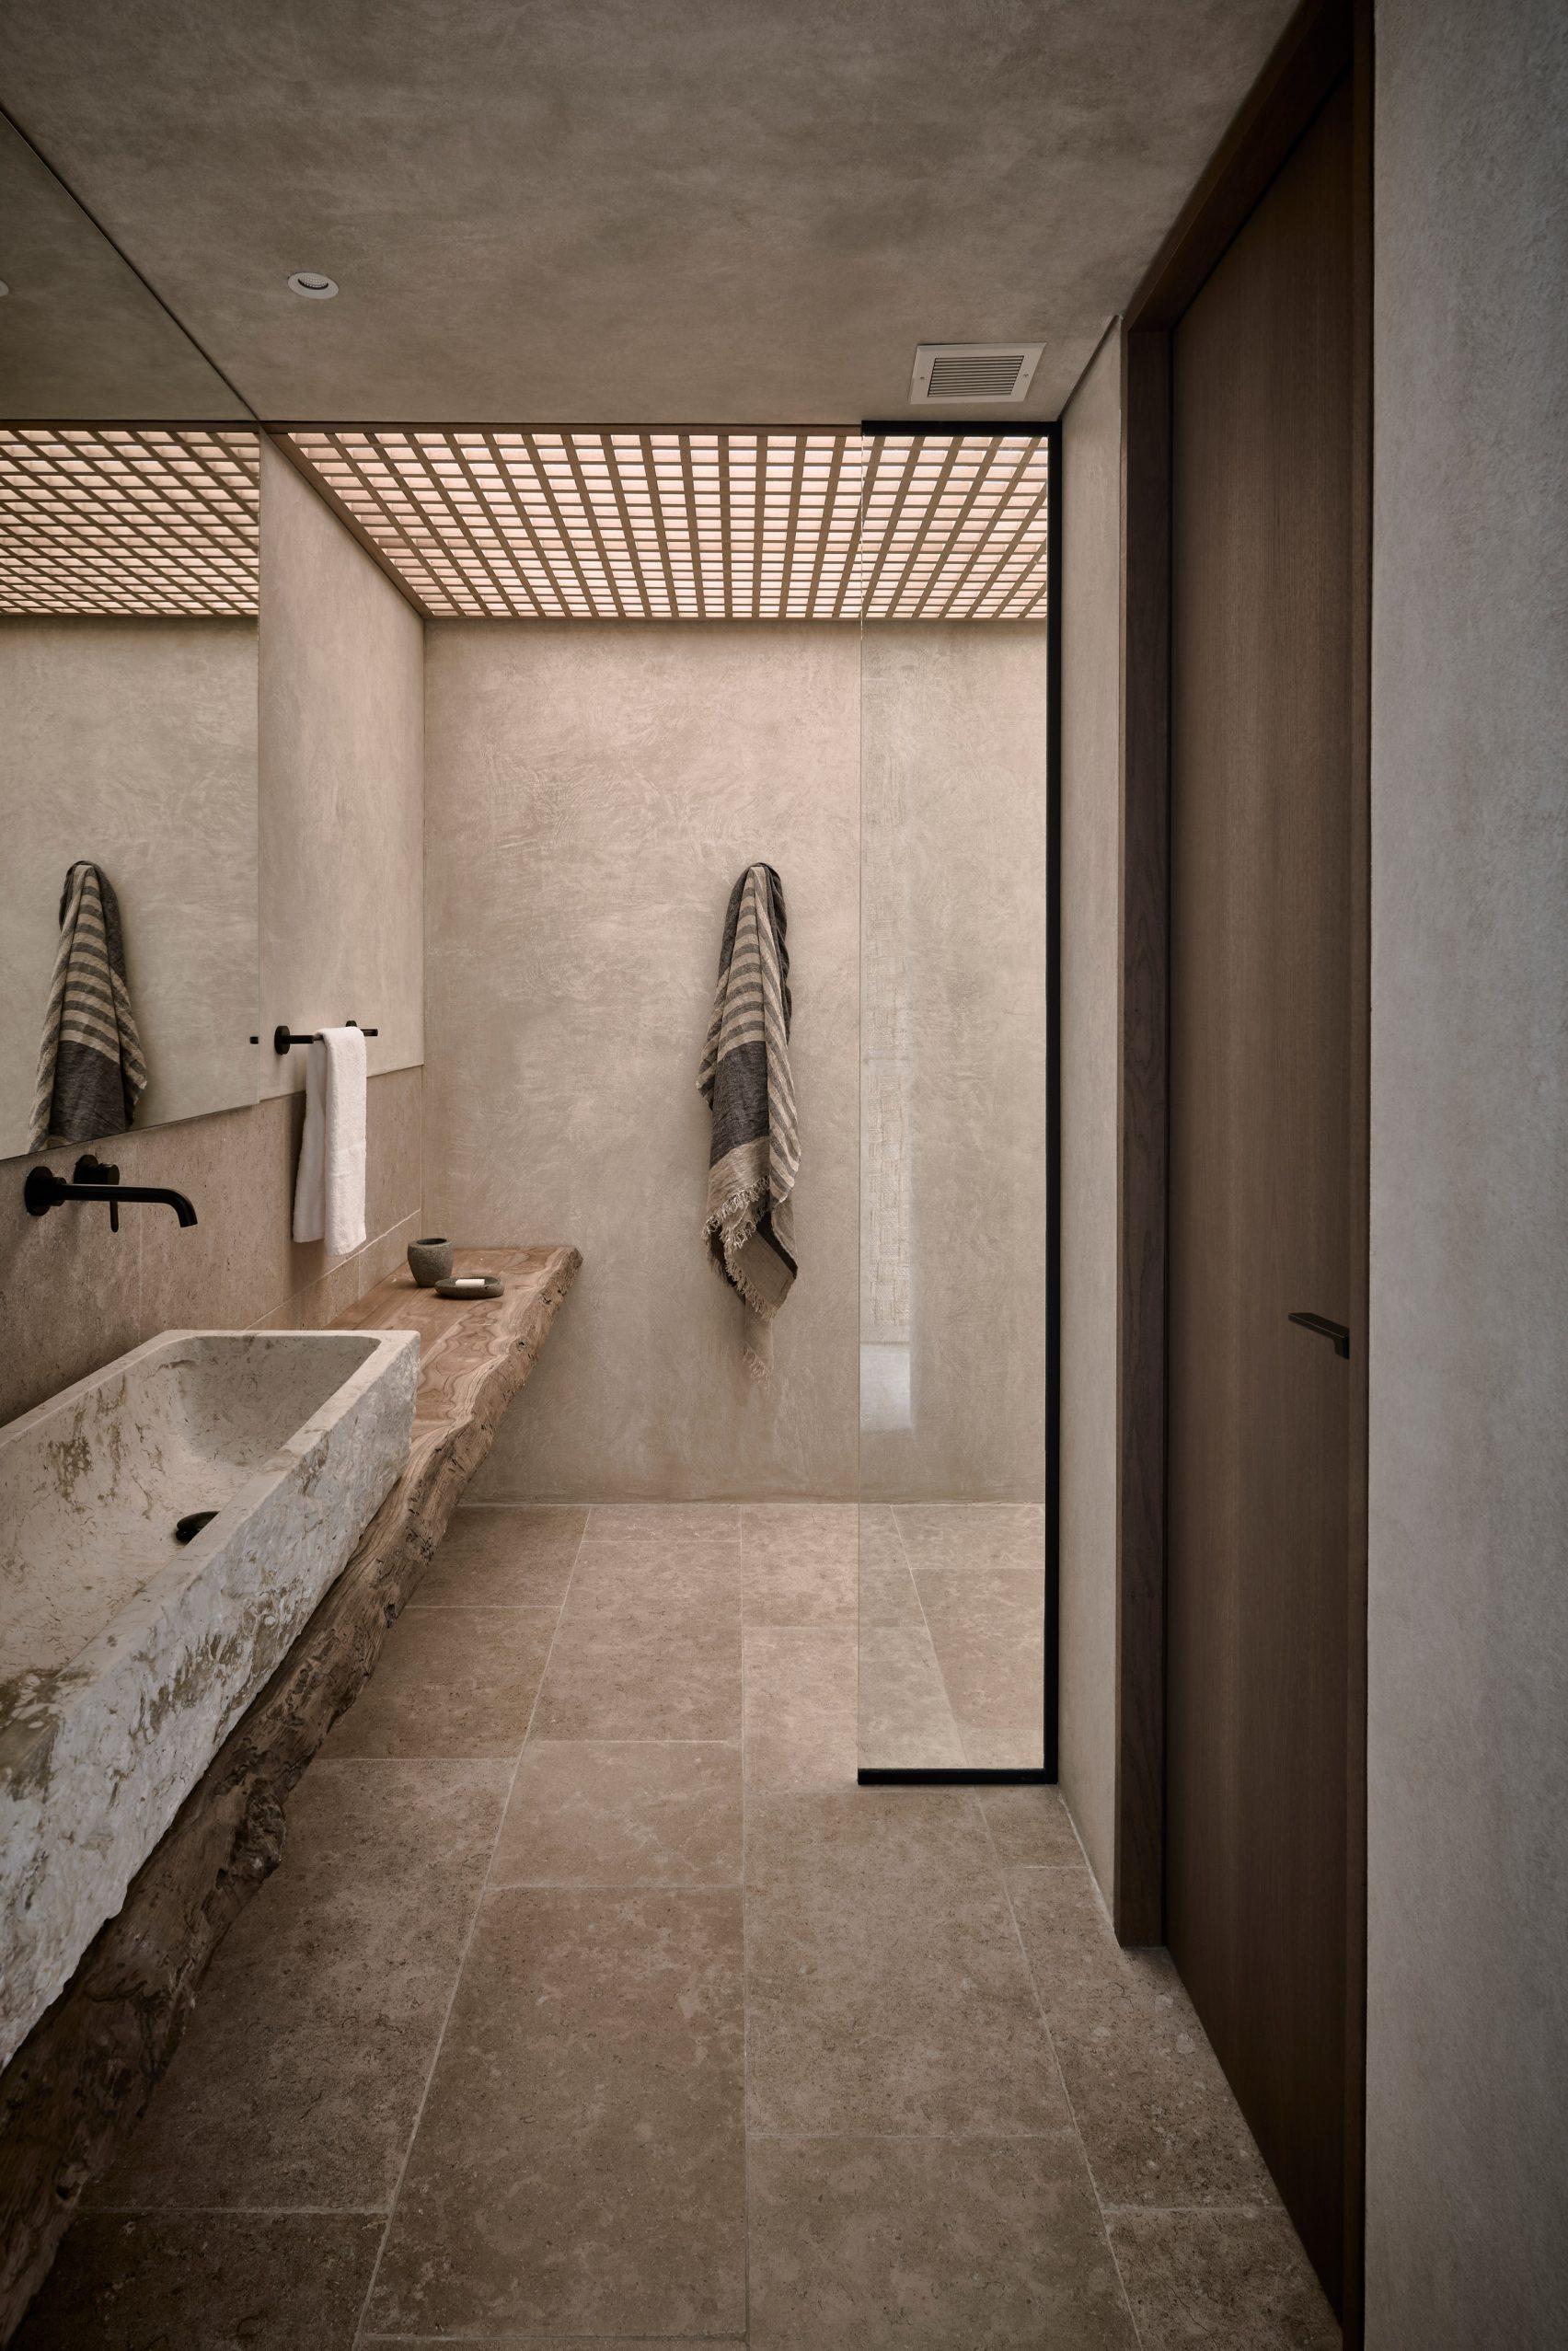 olea hotel moderne inneneinrichtung badezimmer